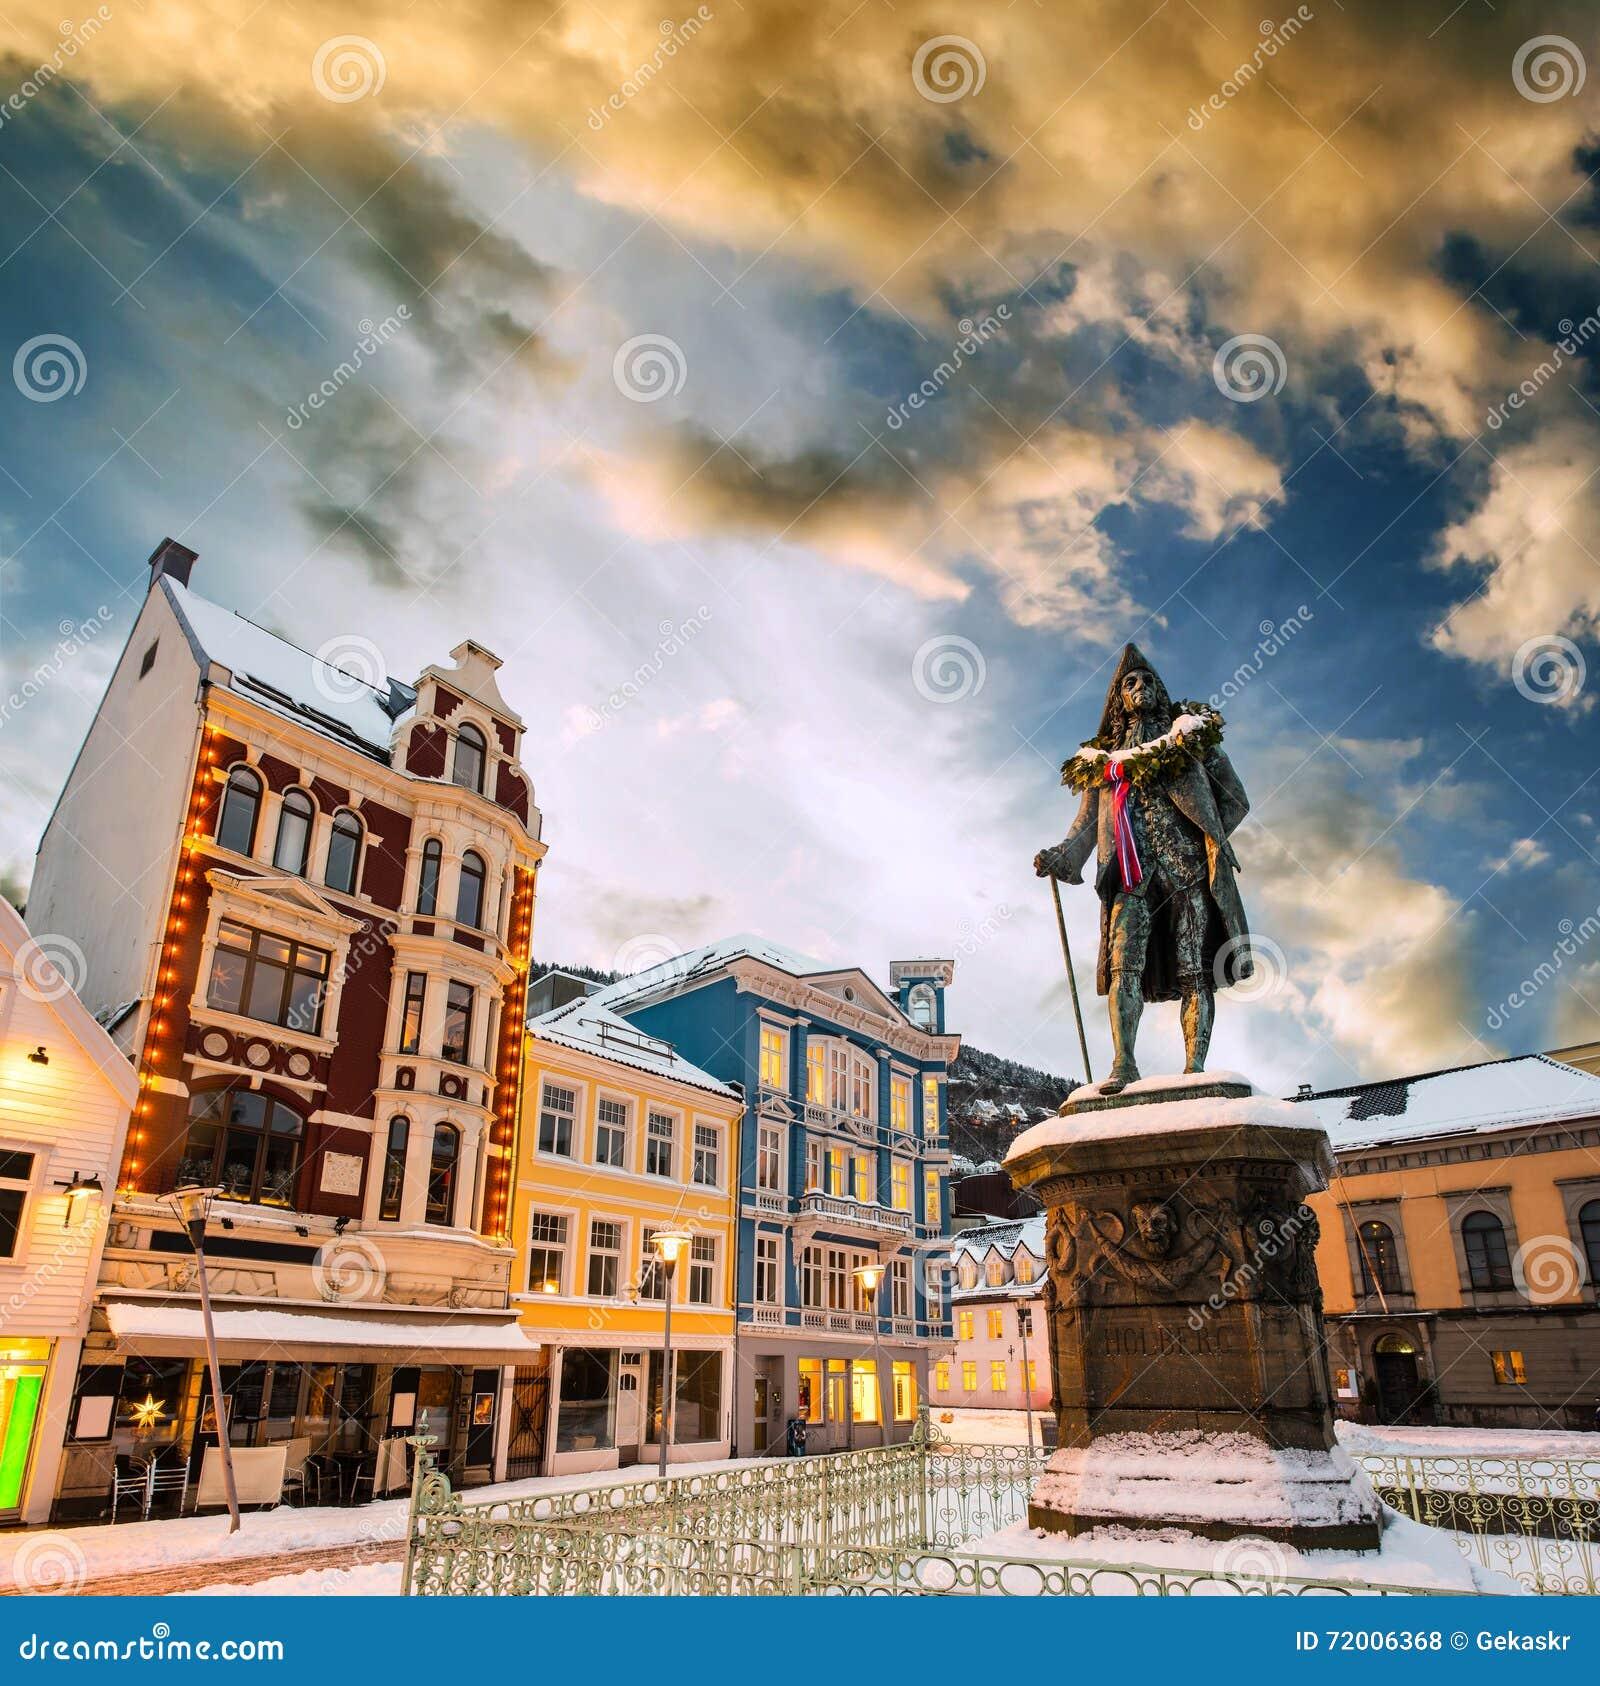 Bergen At Christmas Stock Photo - Image: 72006368